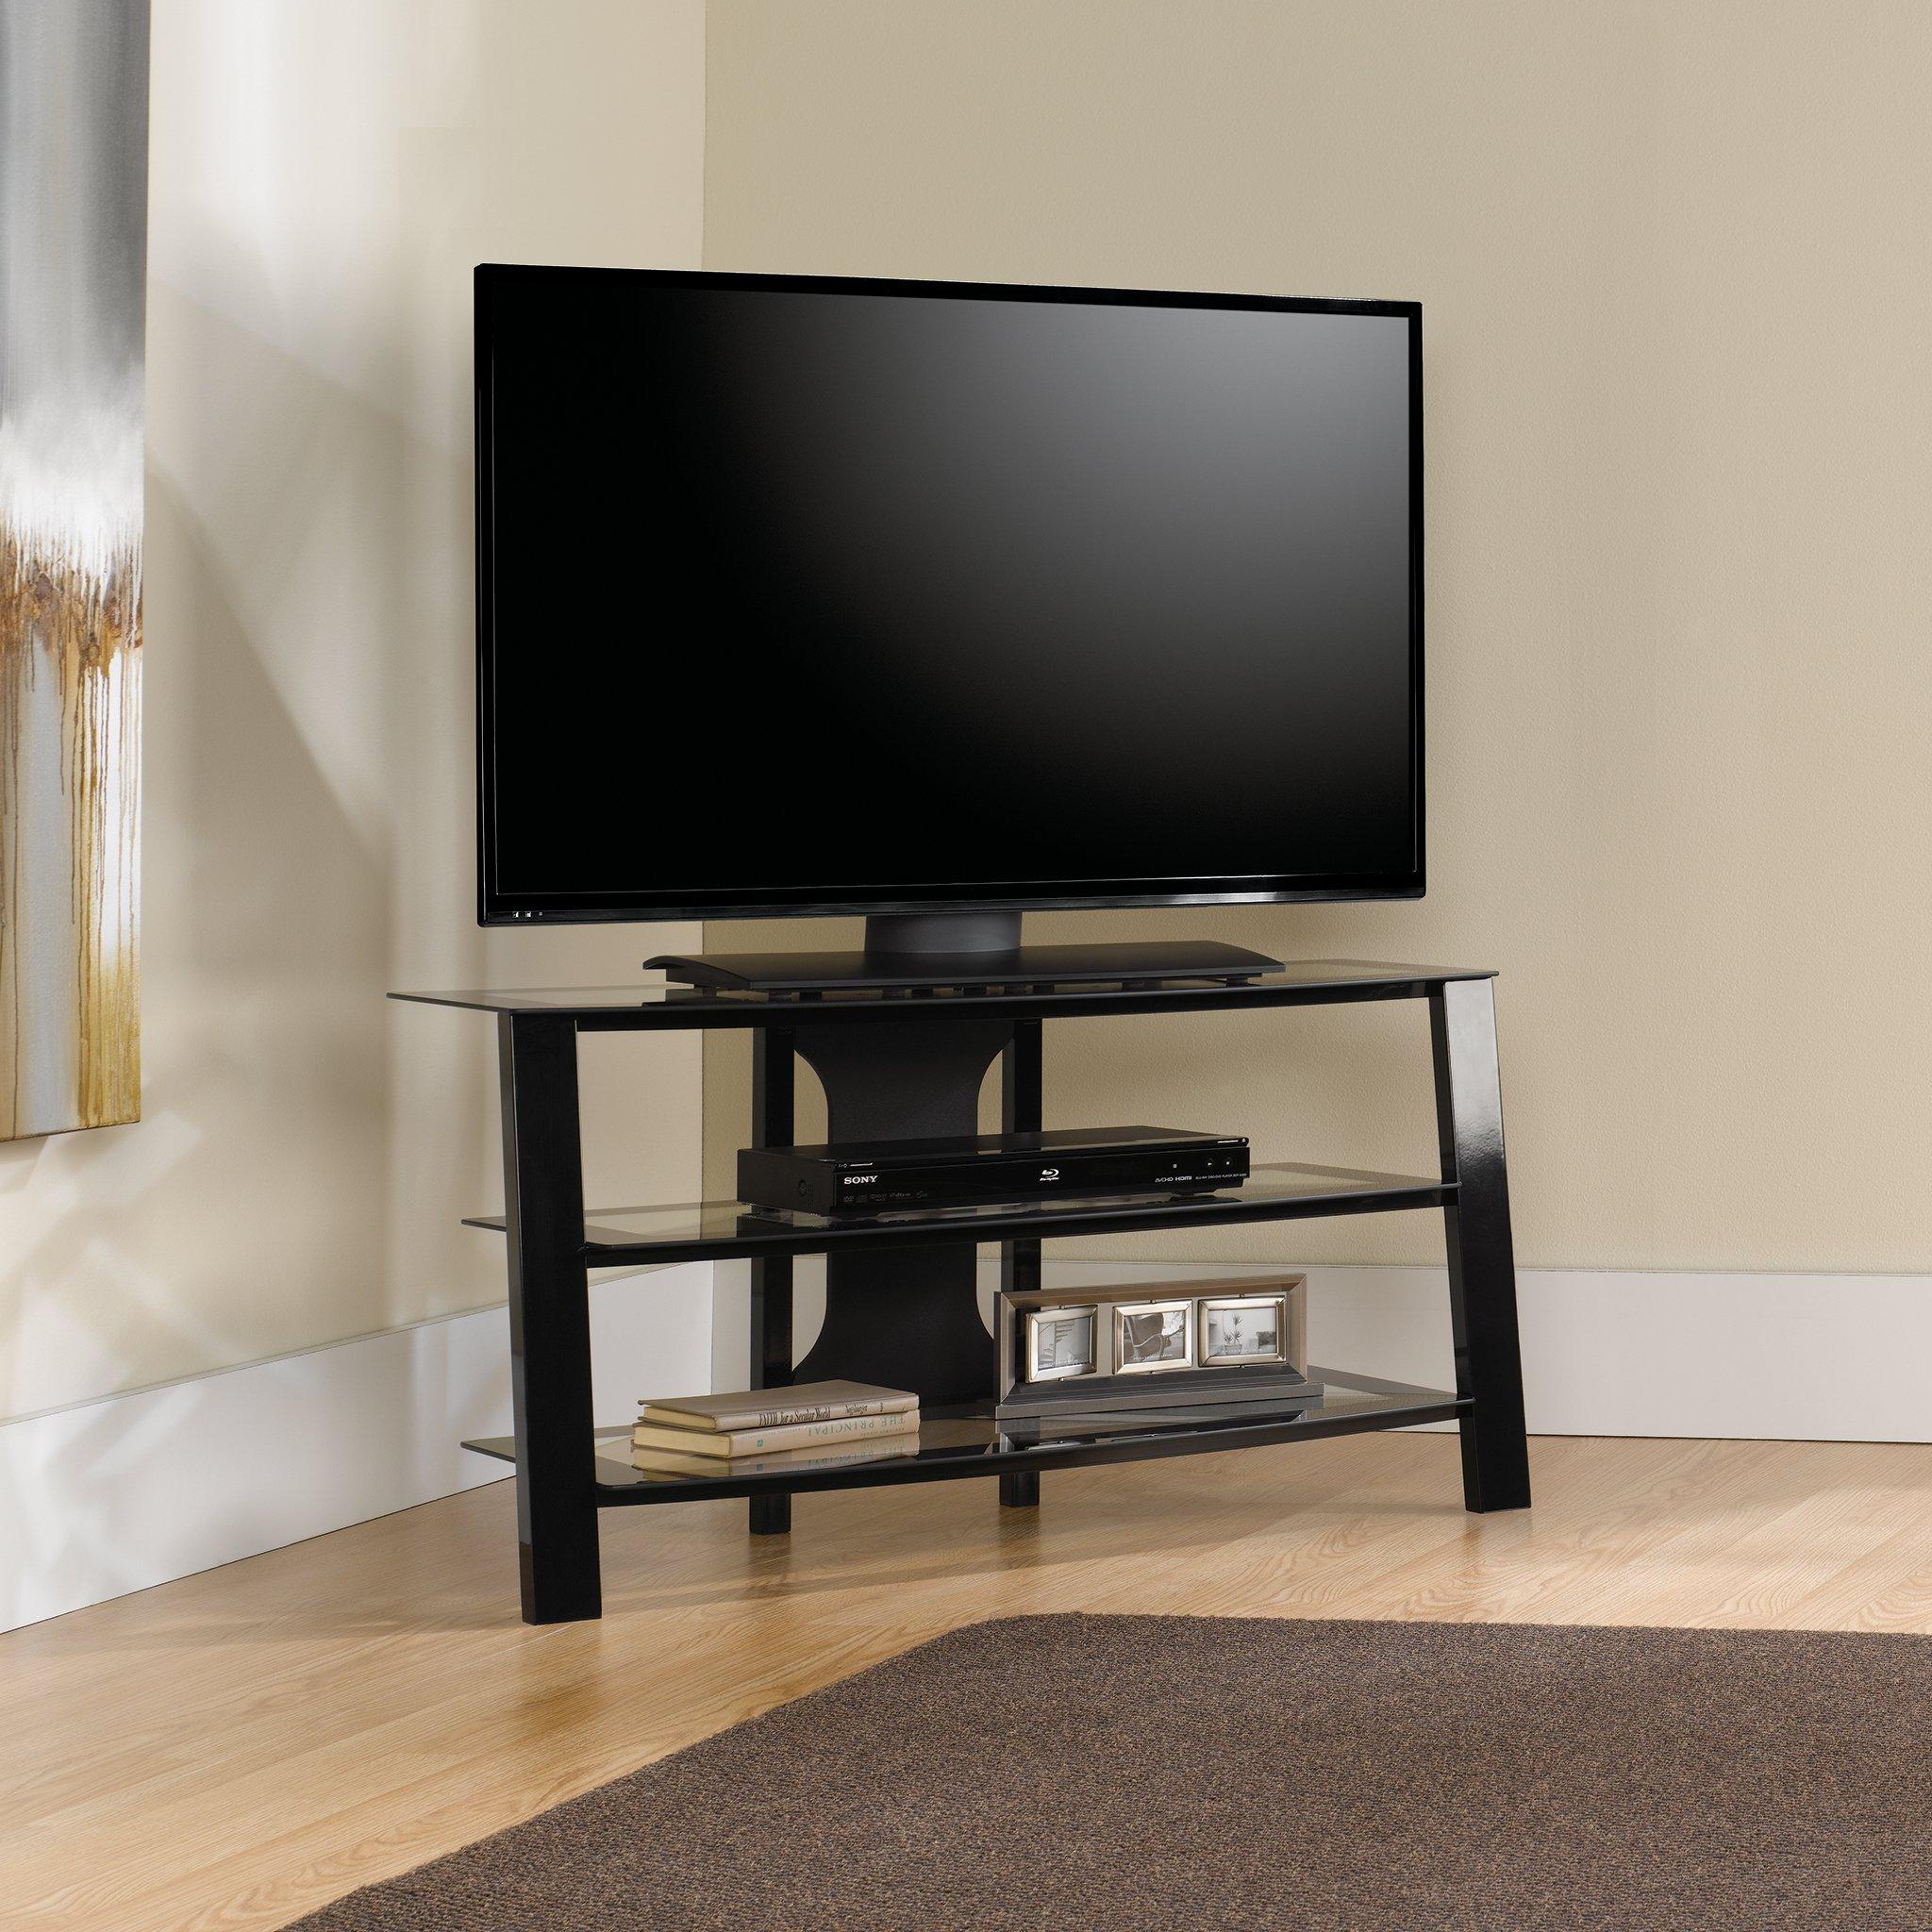 Sauder 412067 Mirage Panel TV Stand, Black/Clear Glass